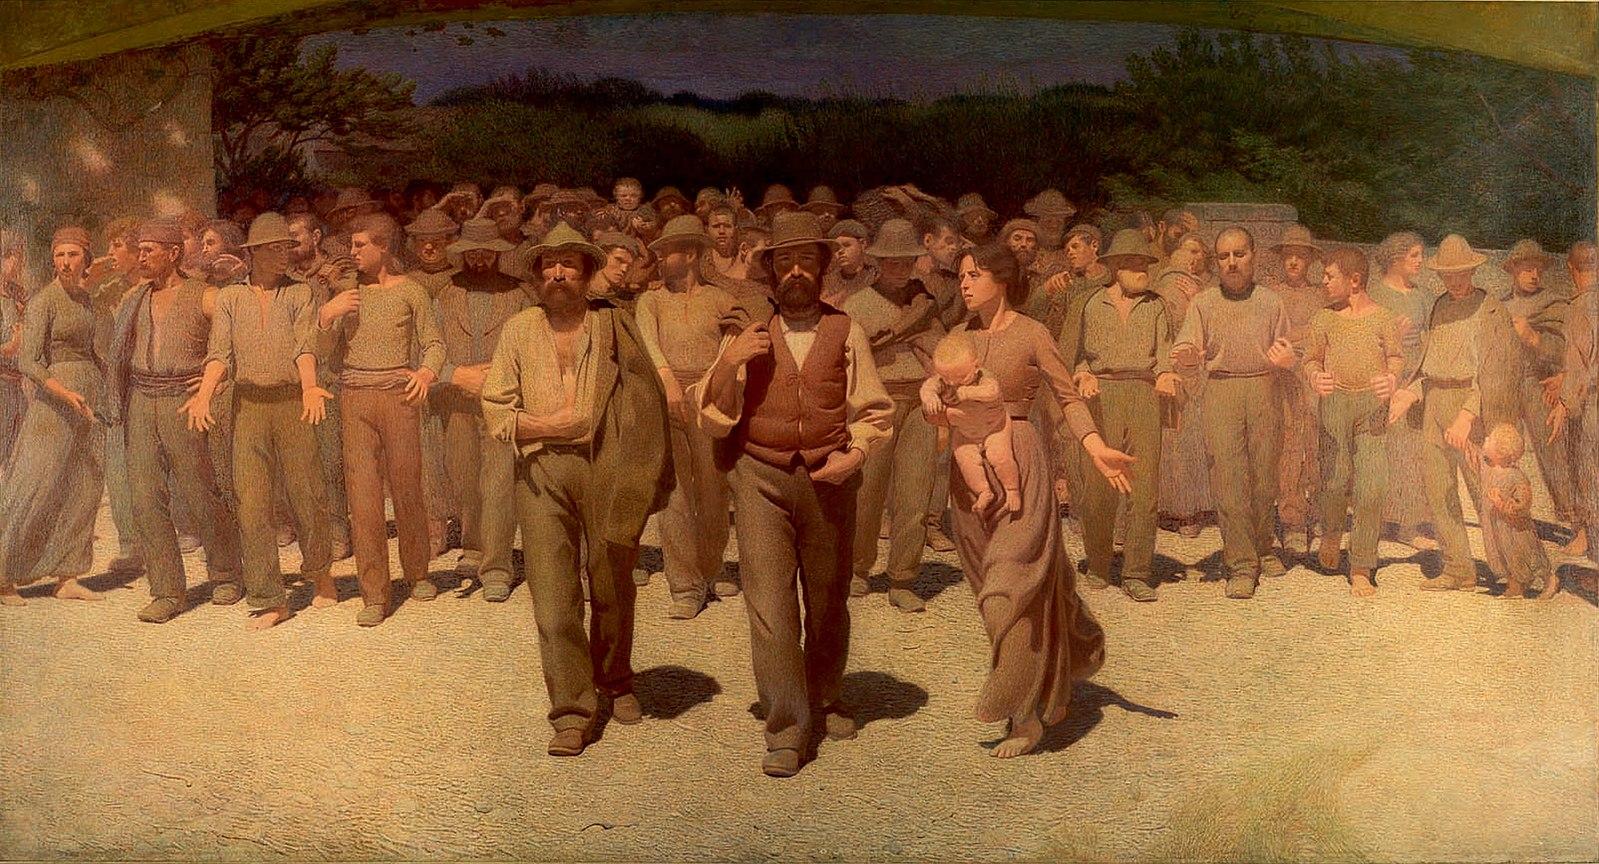 Giuseppe Pelizza da Volpedo, Le quatrième État, 1901 - Histoire - terminale - SchoolMouv